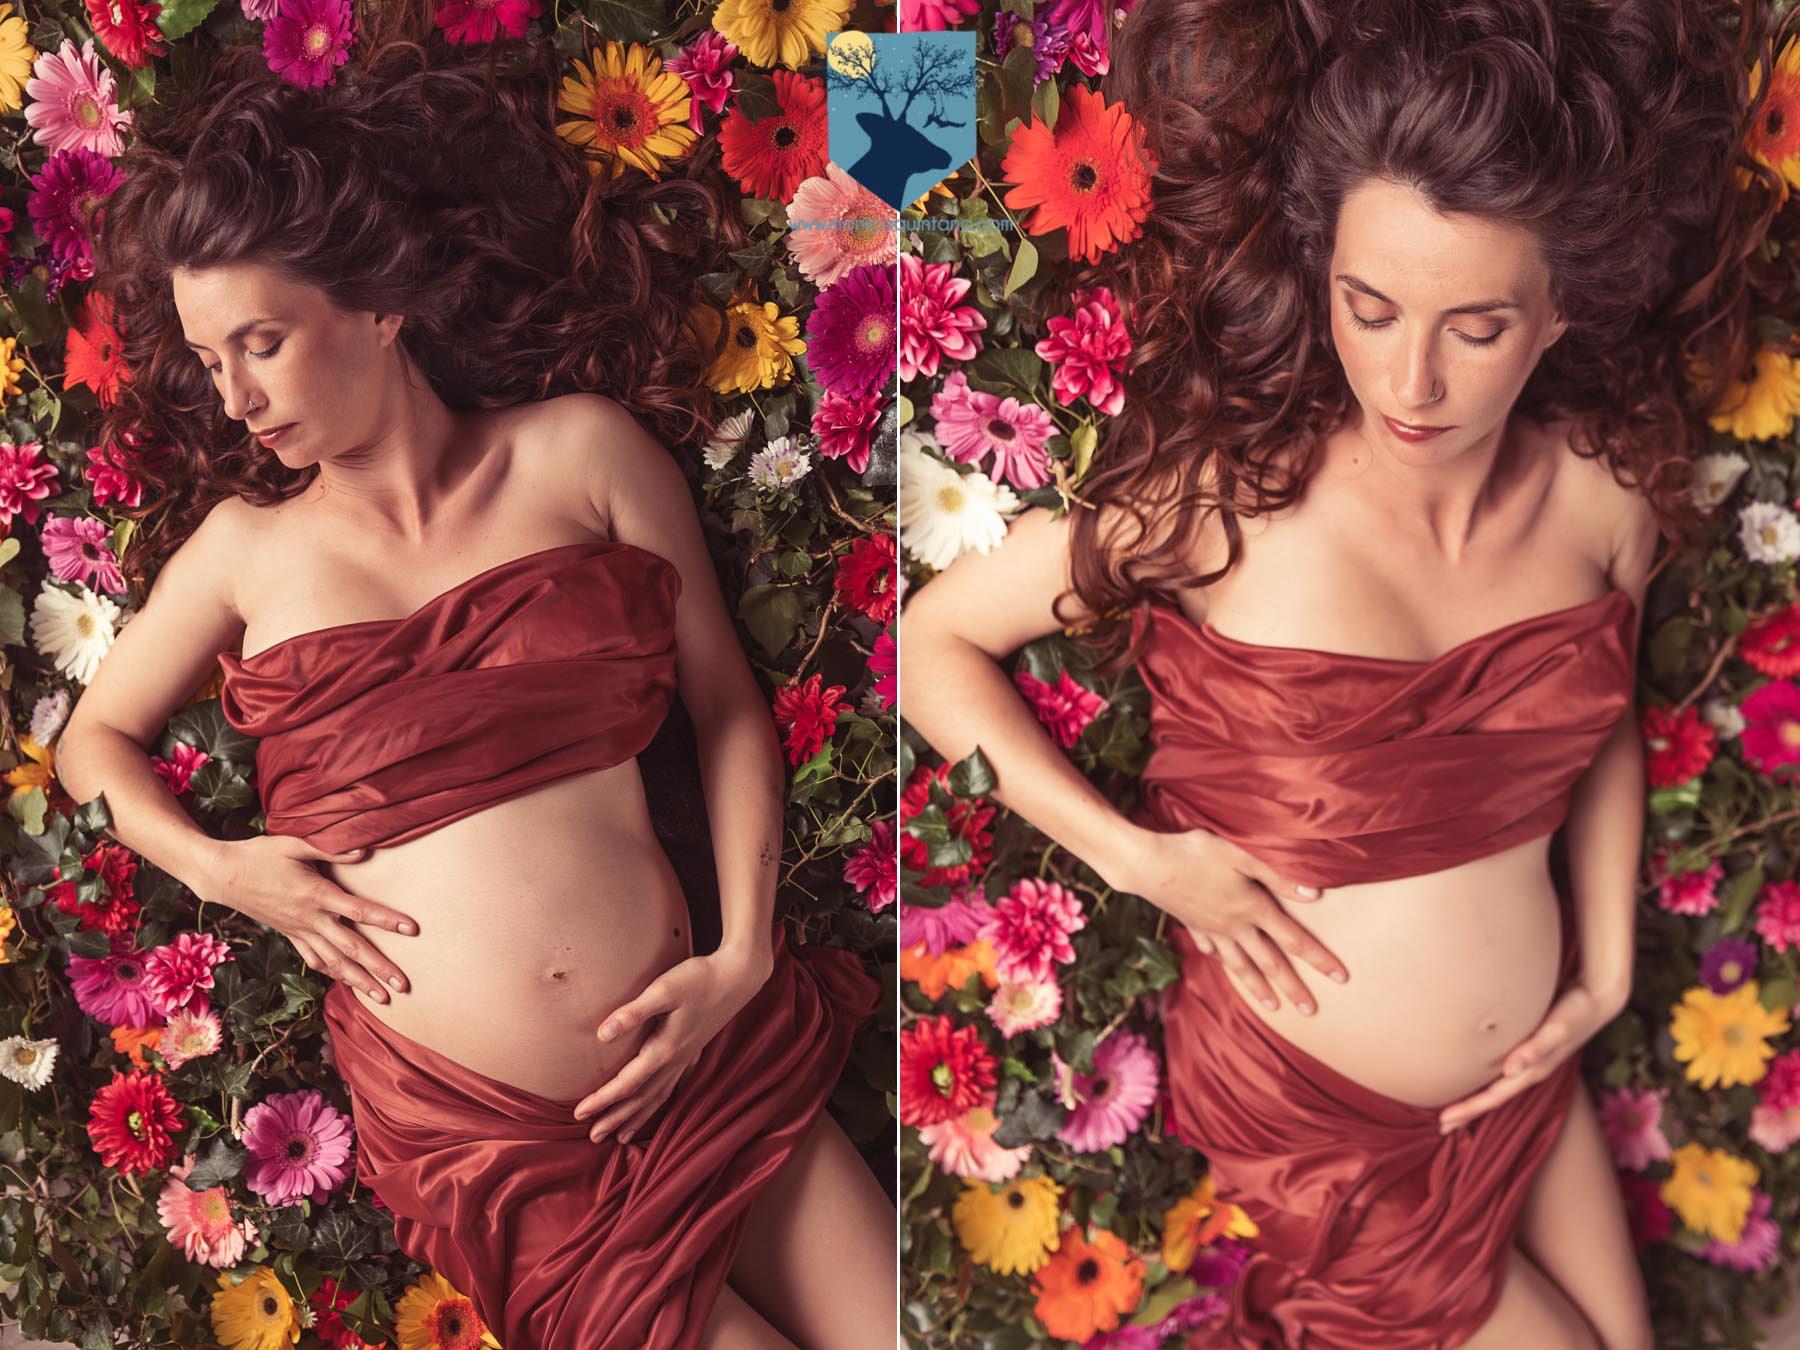 fotografia-girona-figueres-emporda-monica-quintana-familia-retrato-embarazo-estudio-flores-primavera-3